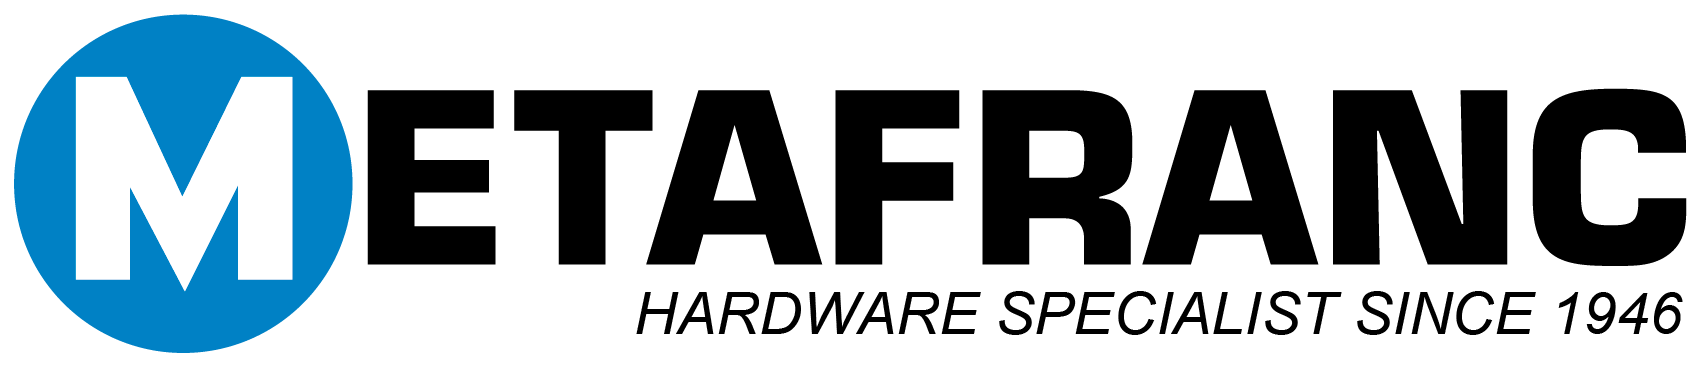 METAFRANC